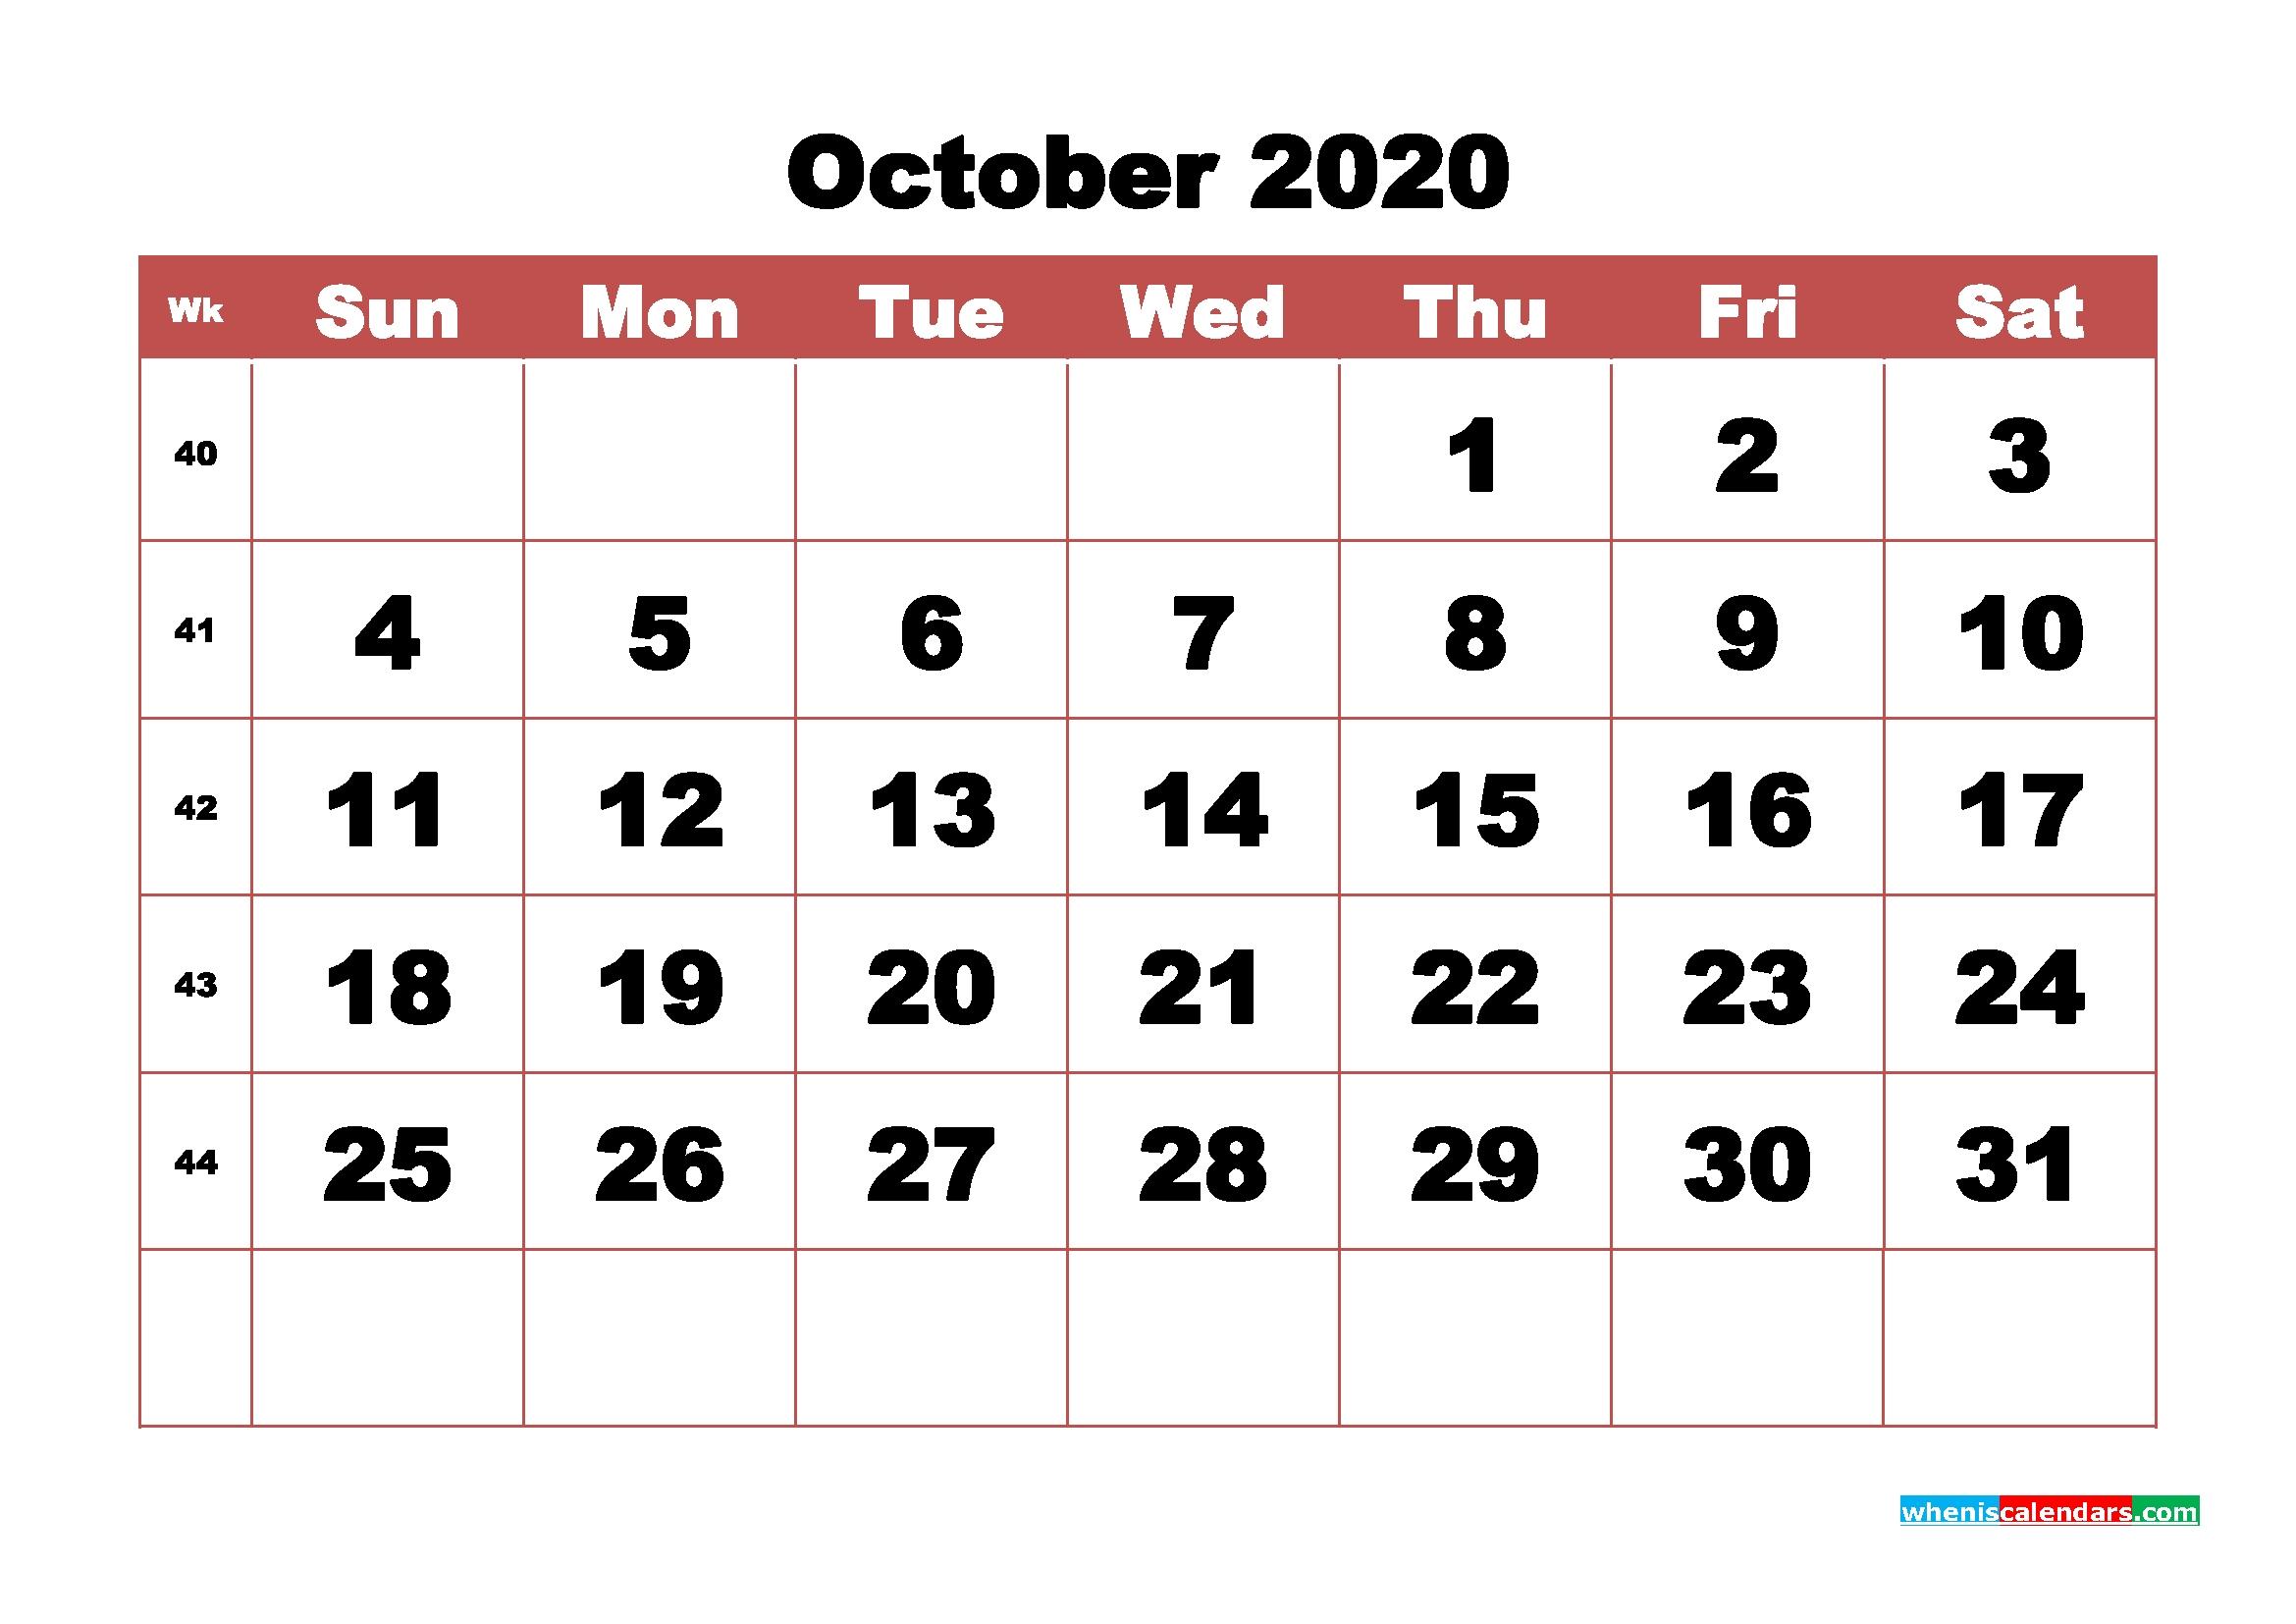 Monthly Printable Calendar 2020 October With Week Numbers | Free Printable 2020 Monthly Calendar-Large Numbers Calendar October